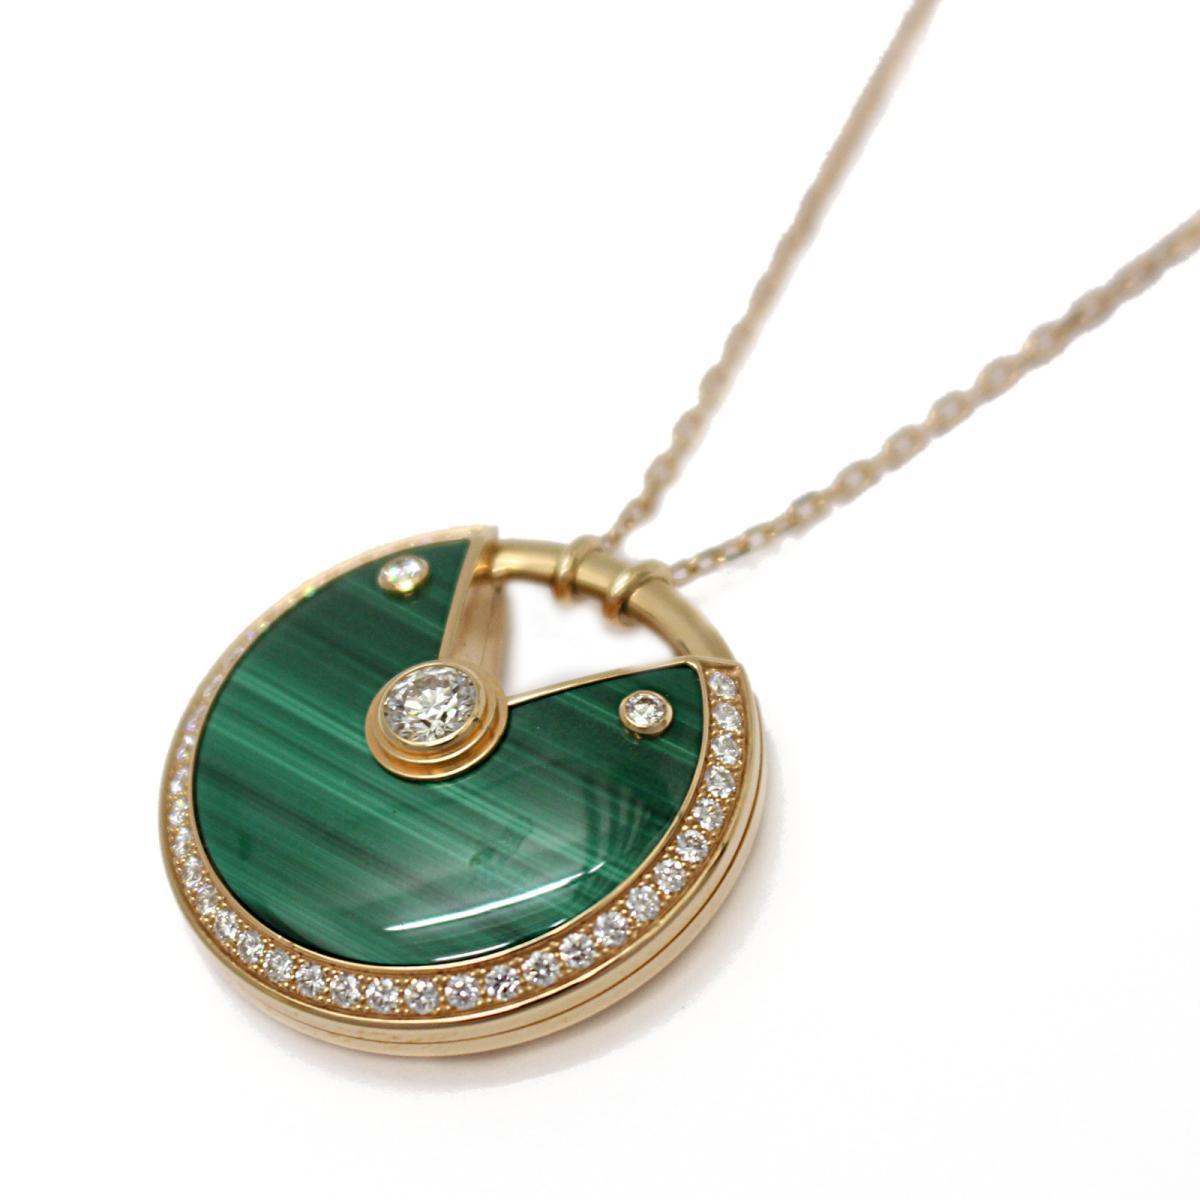 7a2437b08e506 Auth Cartier Amulet de Cartier MM necklace K18PG x malachite x diamond Used  | BRANDOFF Ginza/TOKYO/Japan